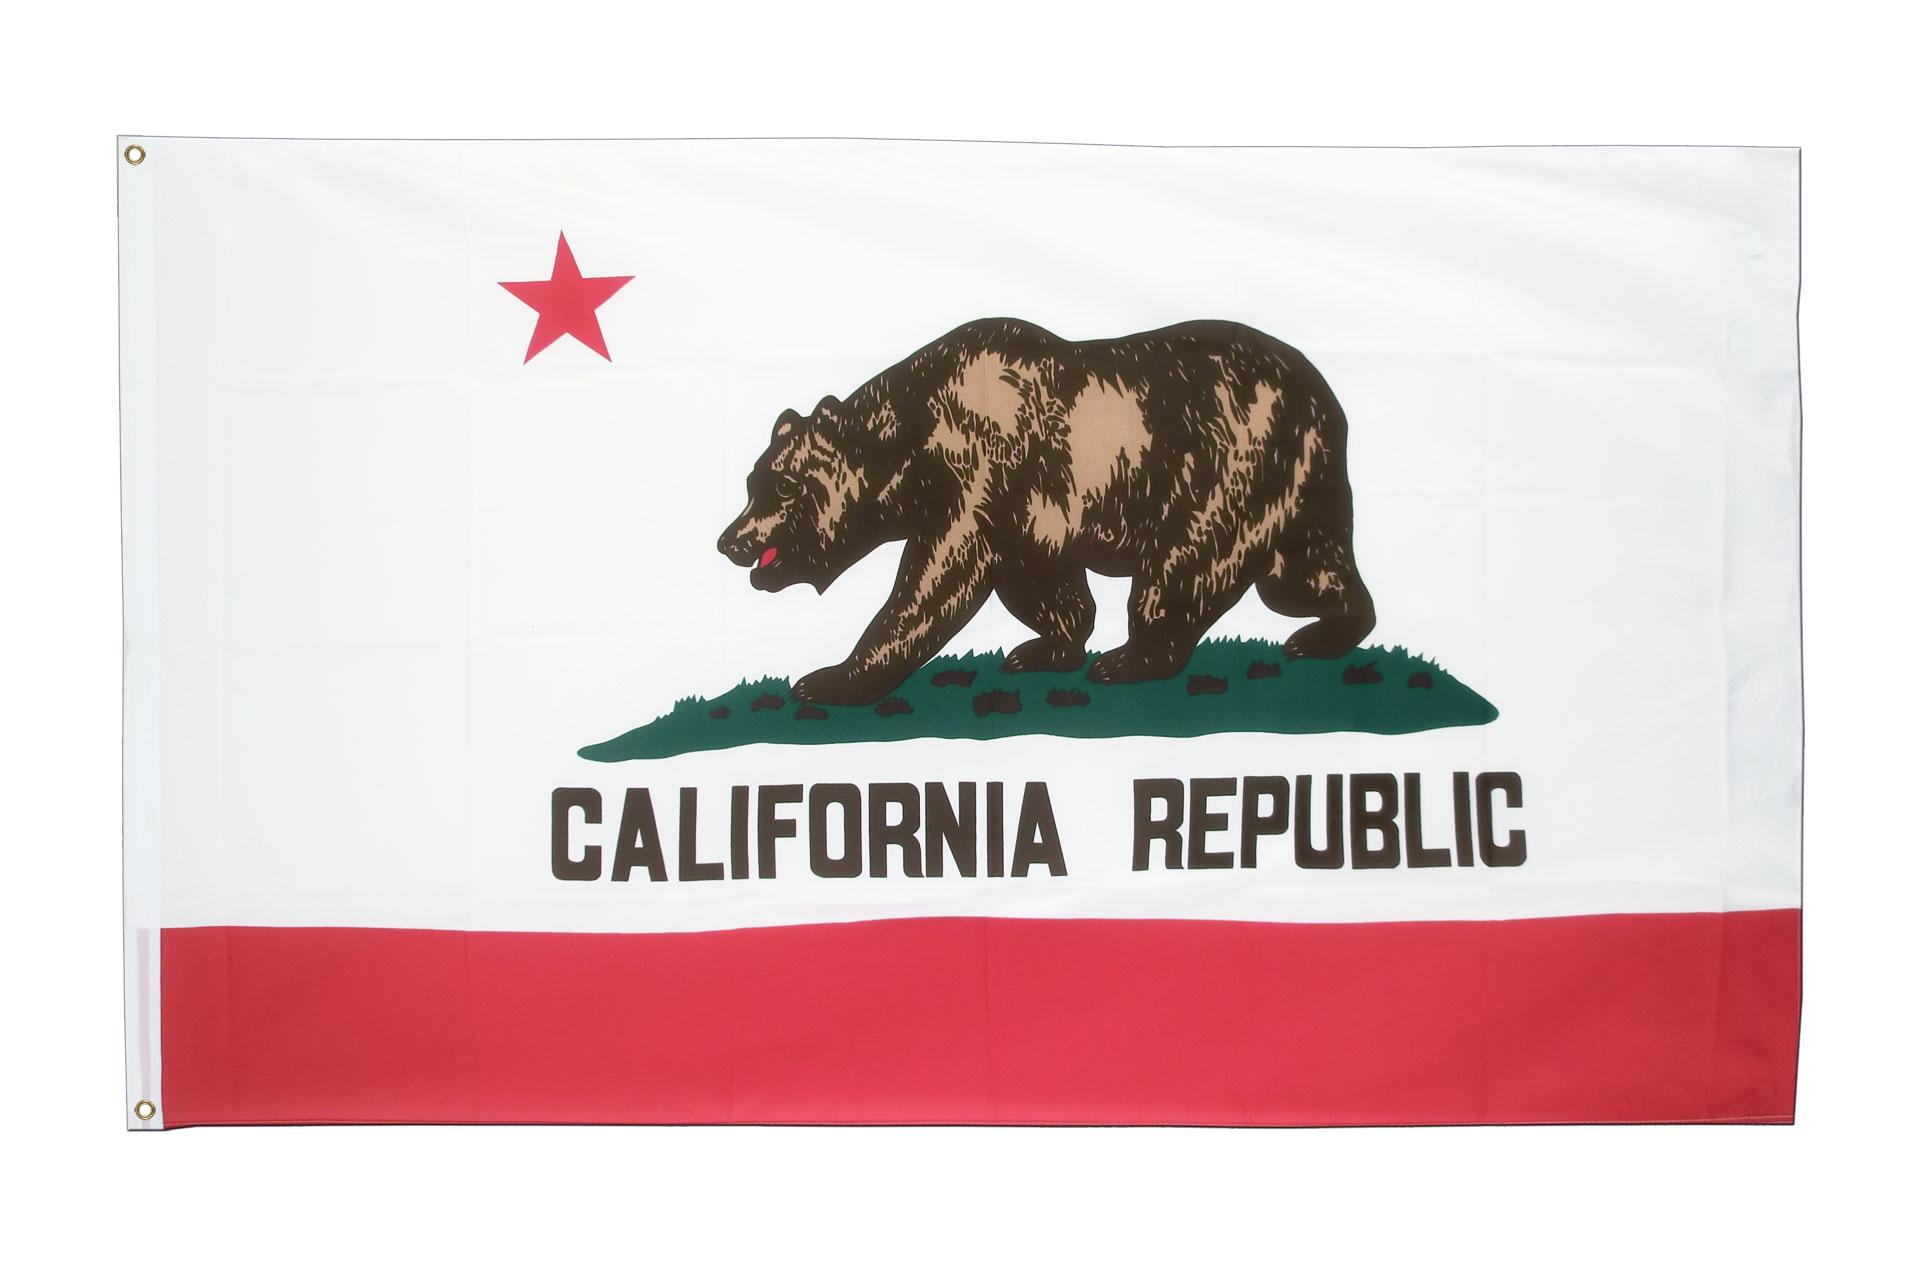 kalifornien fahne kaufen 90 x 150 cm. Black Bedroom Furniture Sets. Home Design Ideas